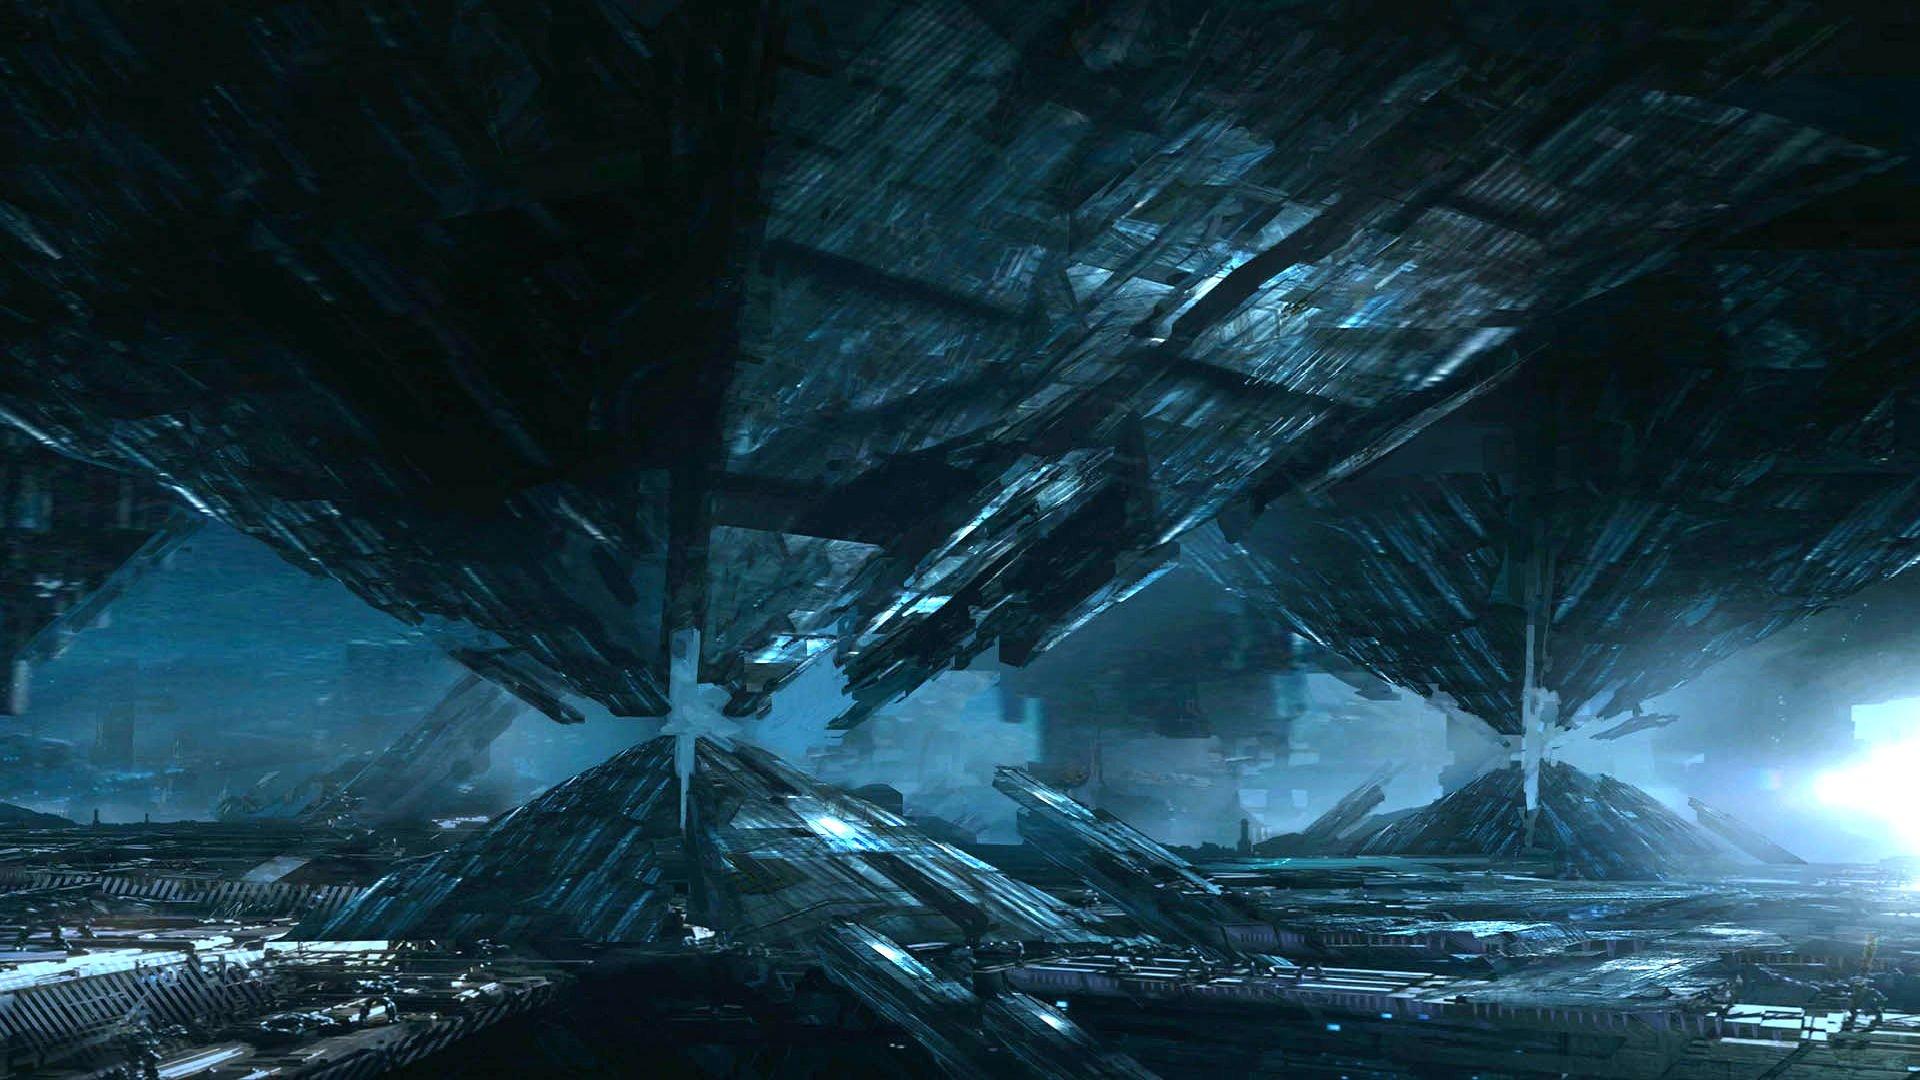 Mass Effect Andromeda Wallpaper By Redliner On Deviantart 1920x1080